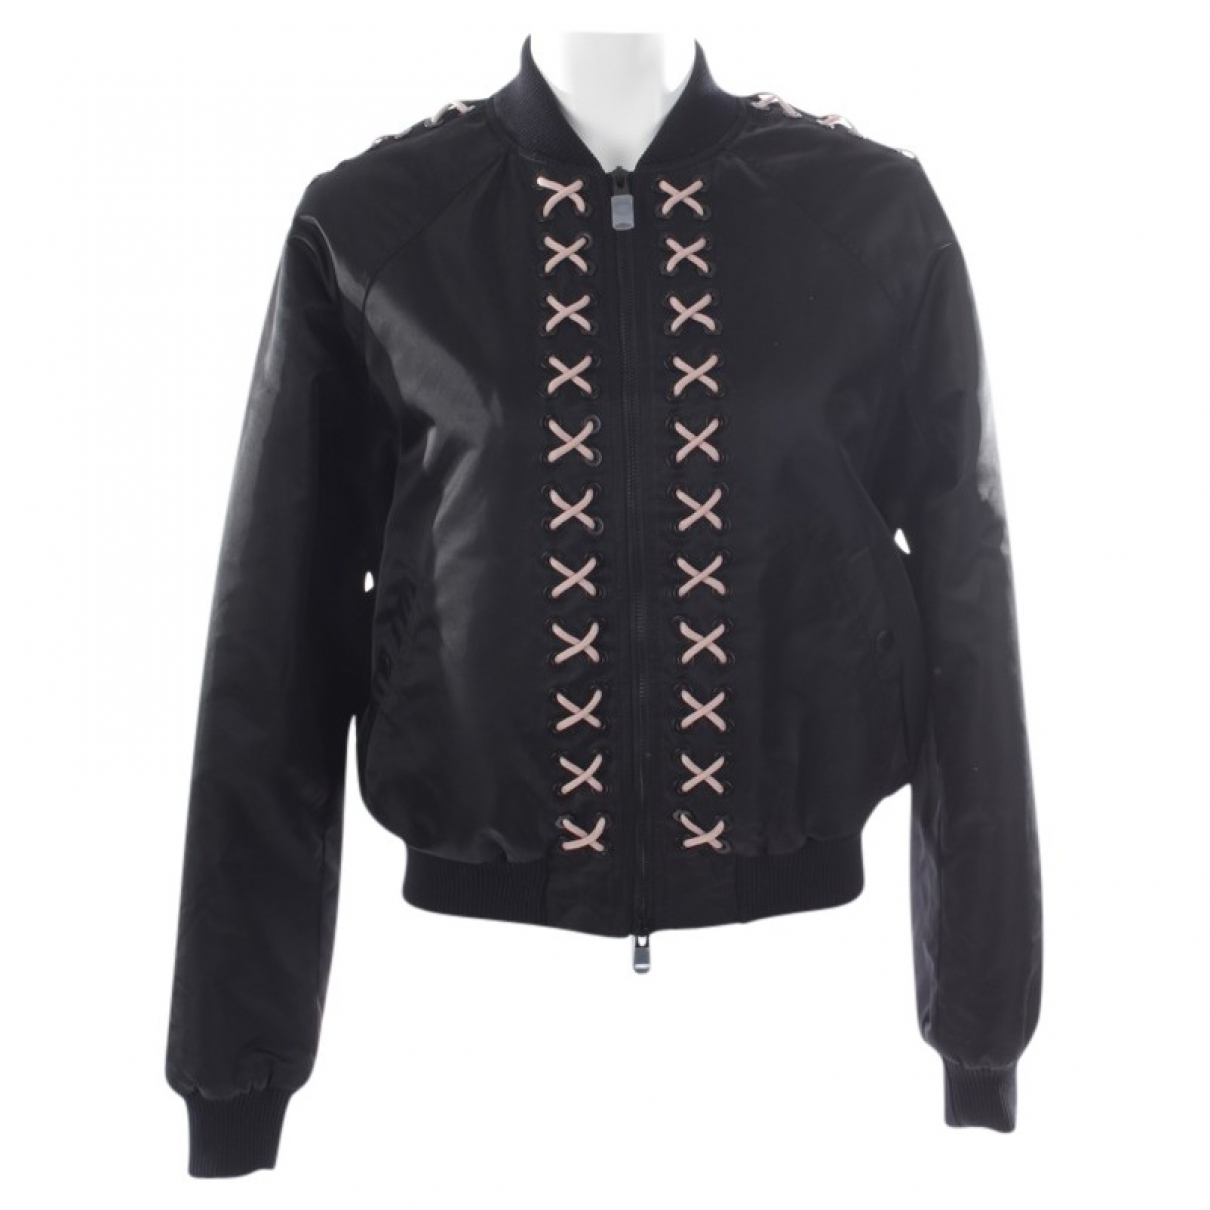 Cinq À Sept \N Black jacket for Women M International